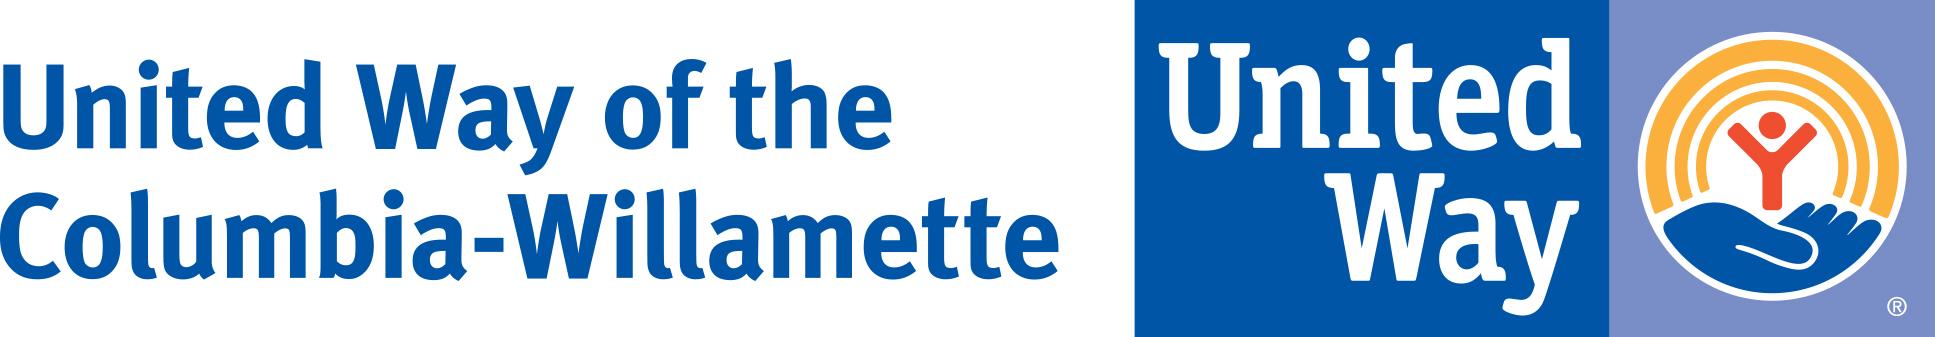 United Way of Columbia Willamette